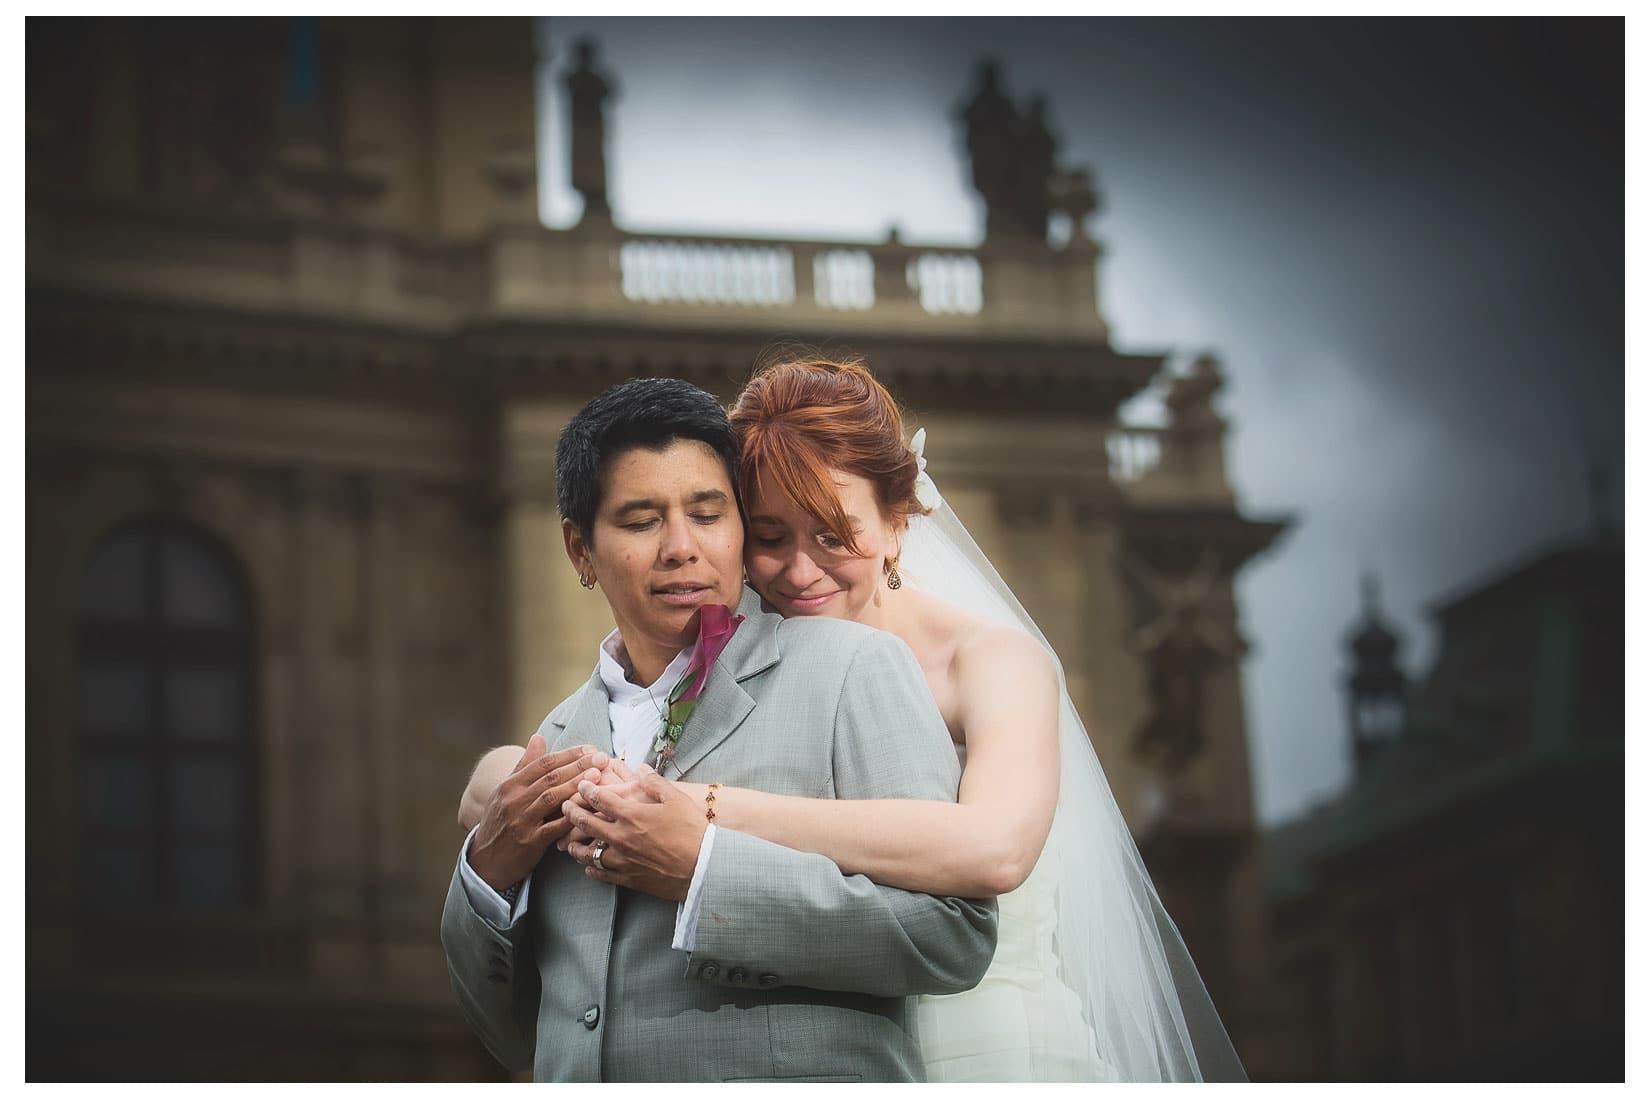 Charles Bridge Wedding / Kimberly & Jules / Rudolfinum wedding portraits